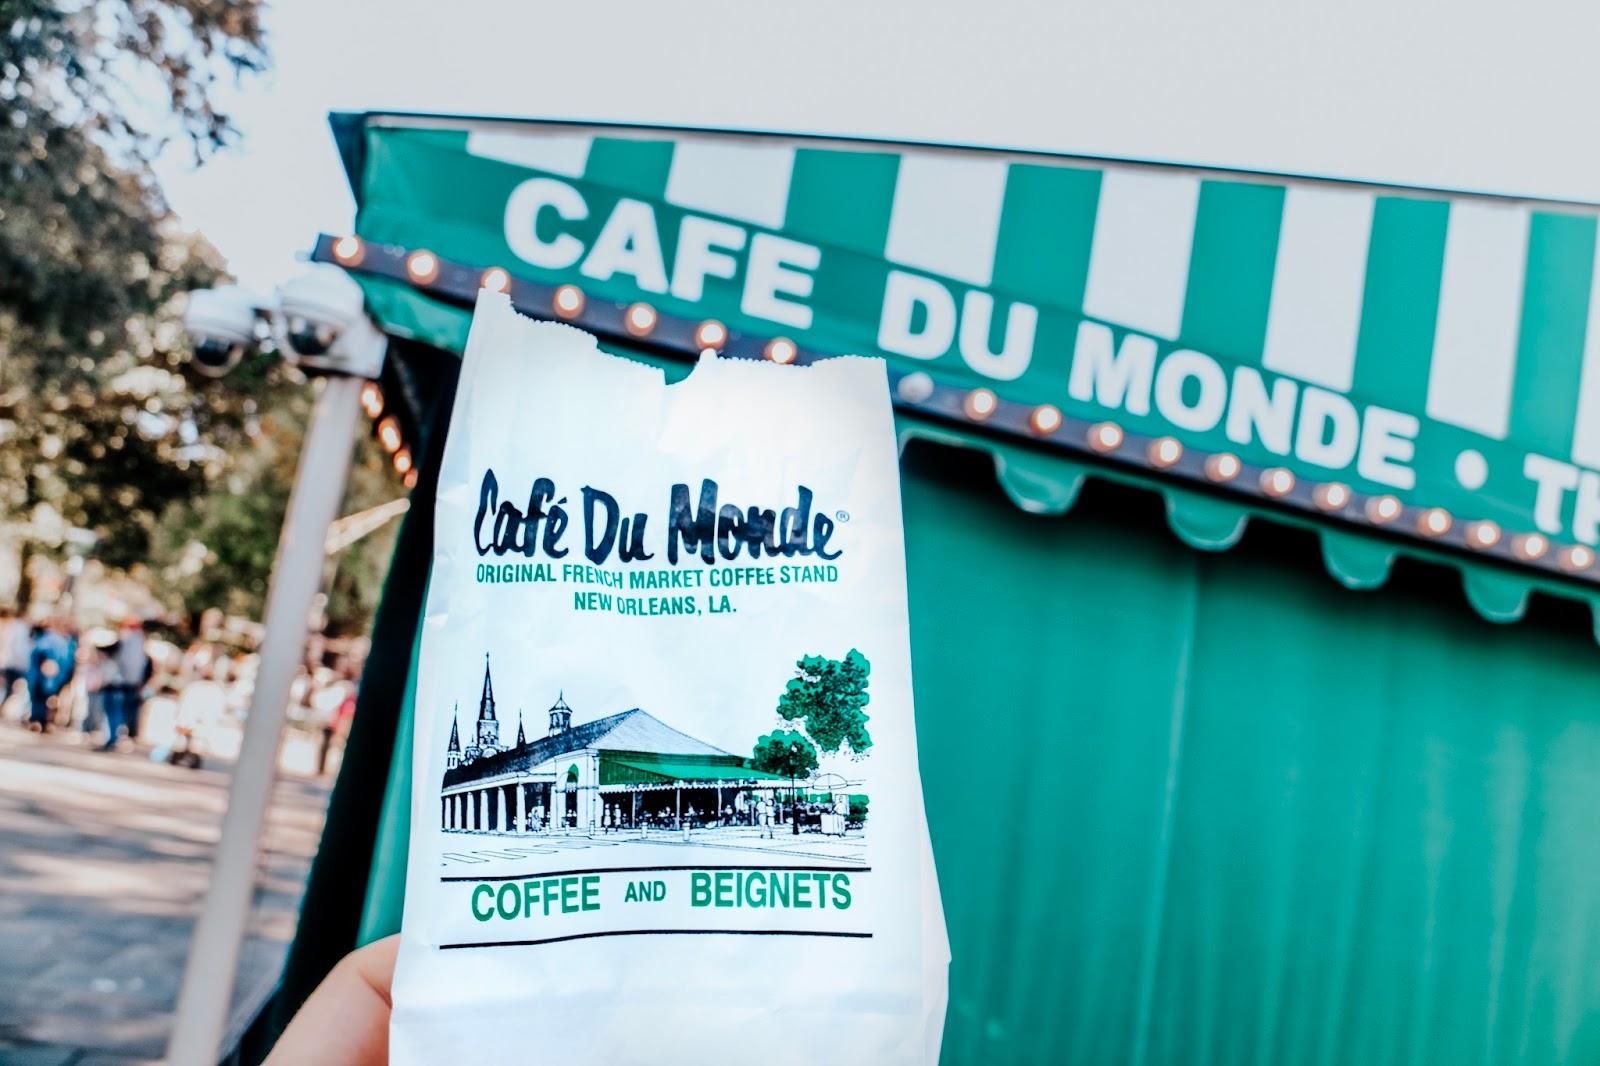 To go bag of beignets at Cafe du Monde in New Orleans